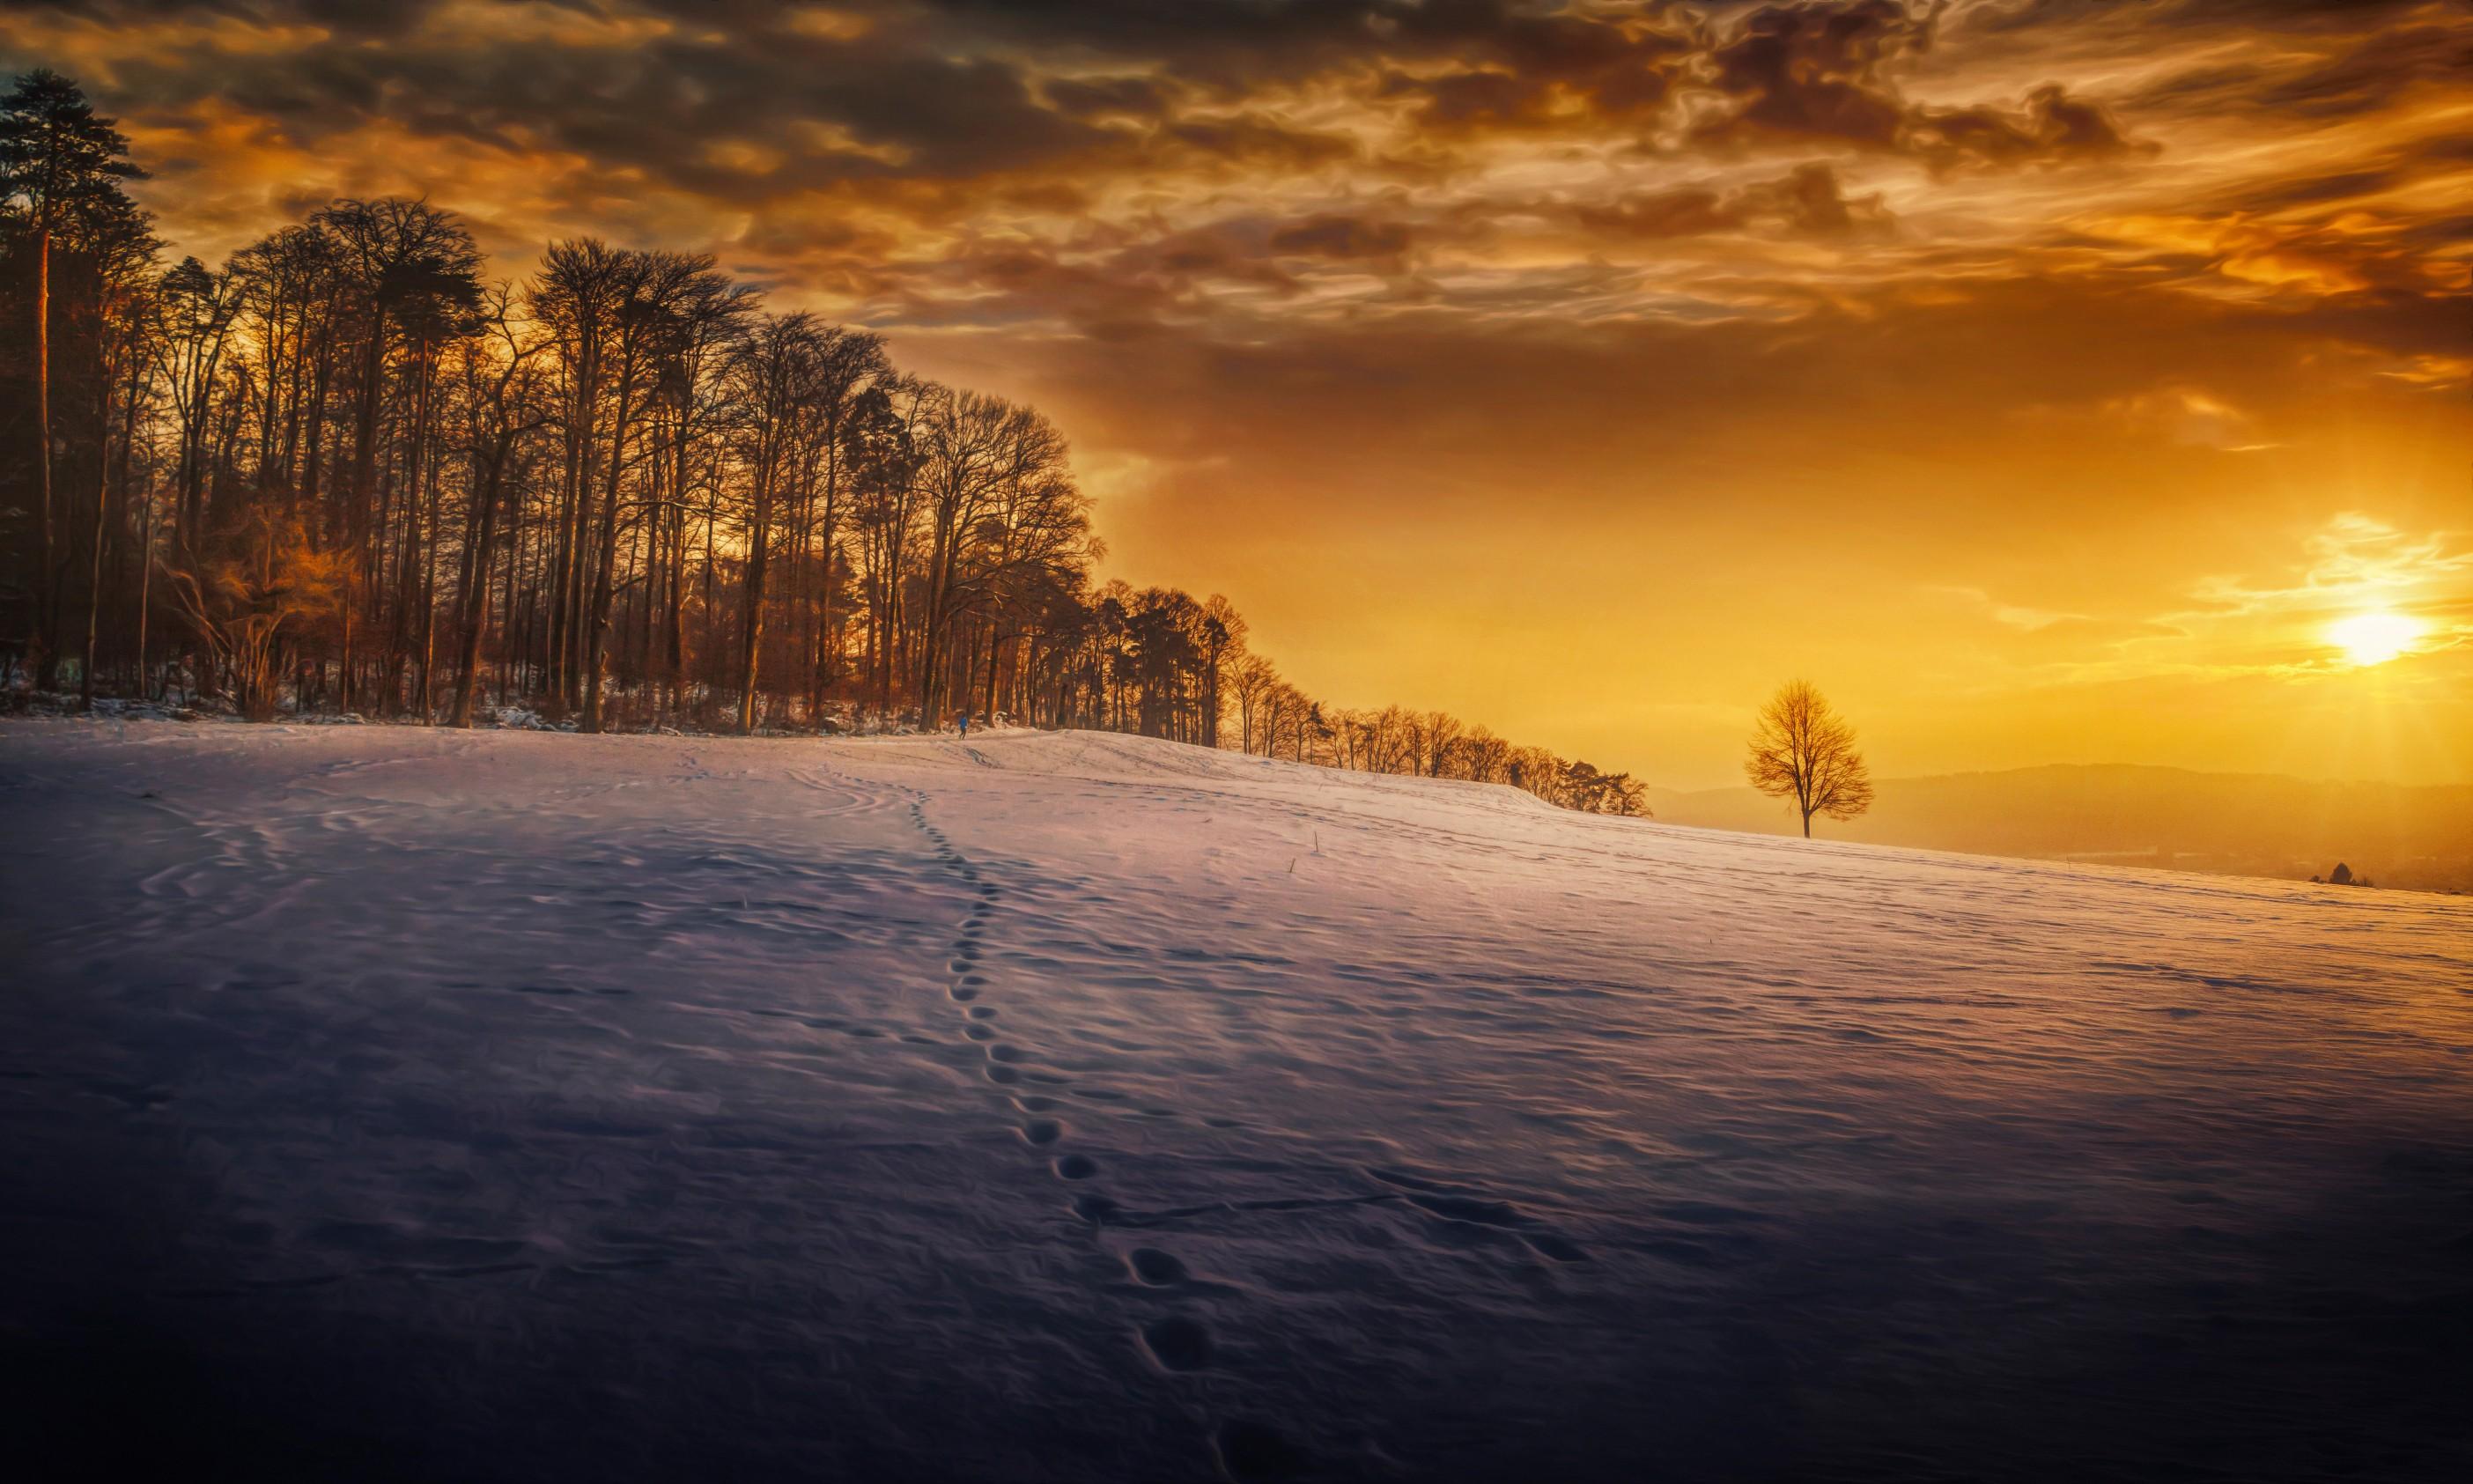 evening snow landscape trees 1574939591 - Evening Snow Landscape Trees -